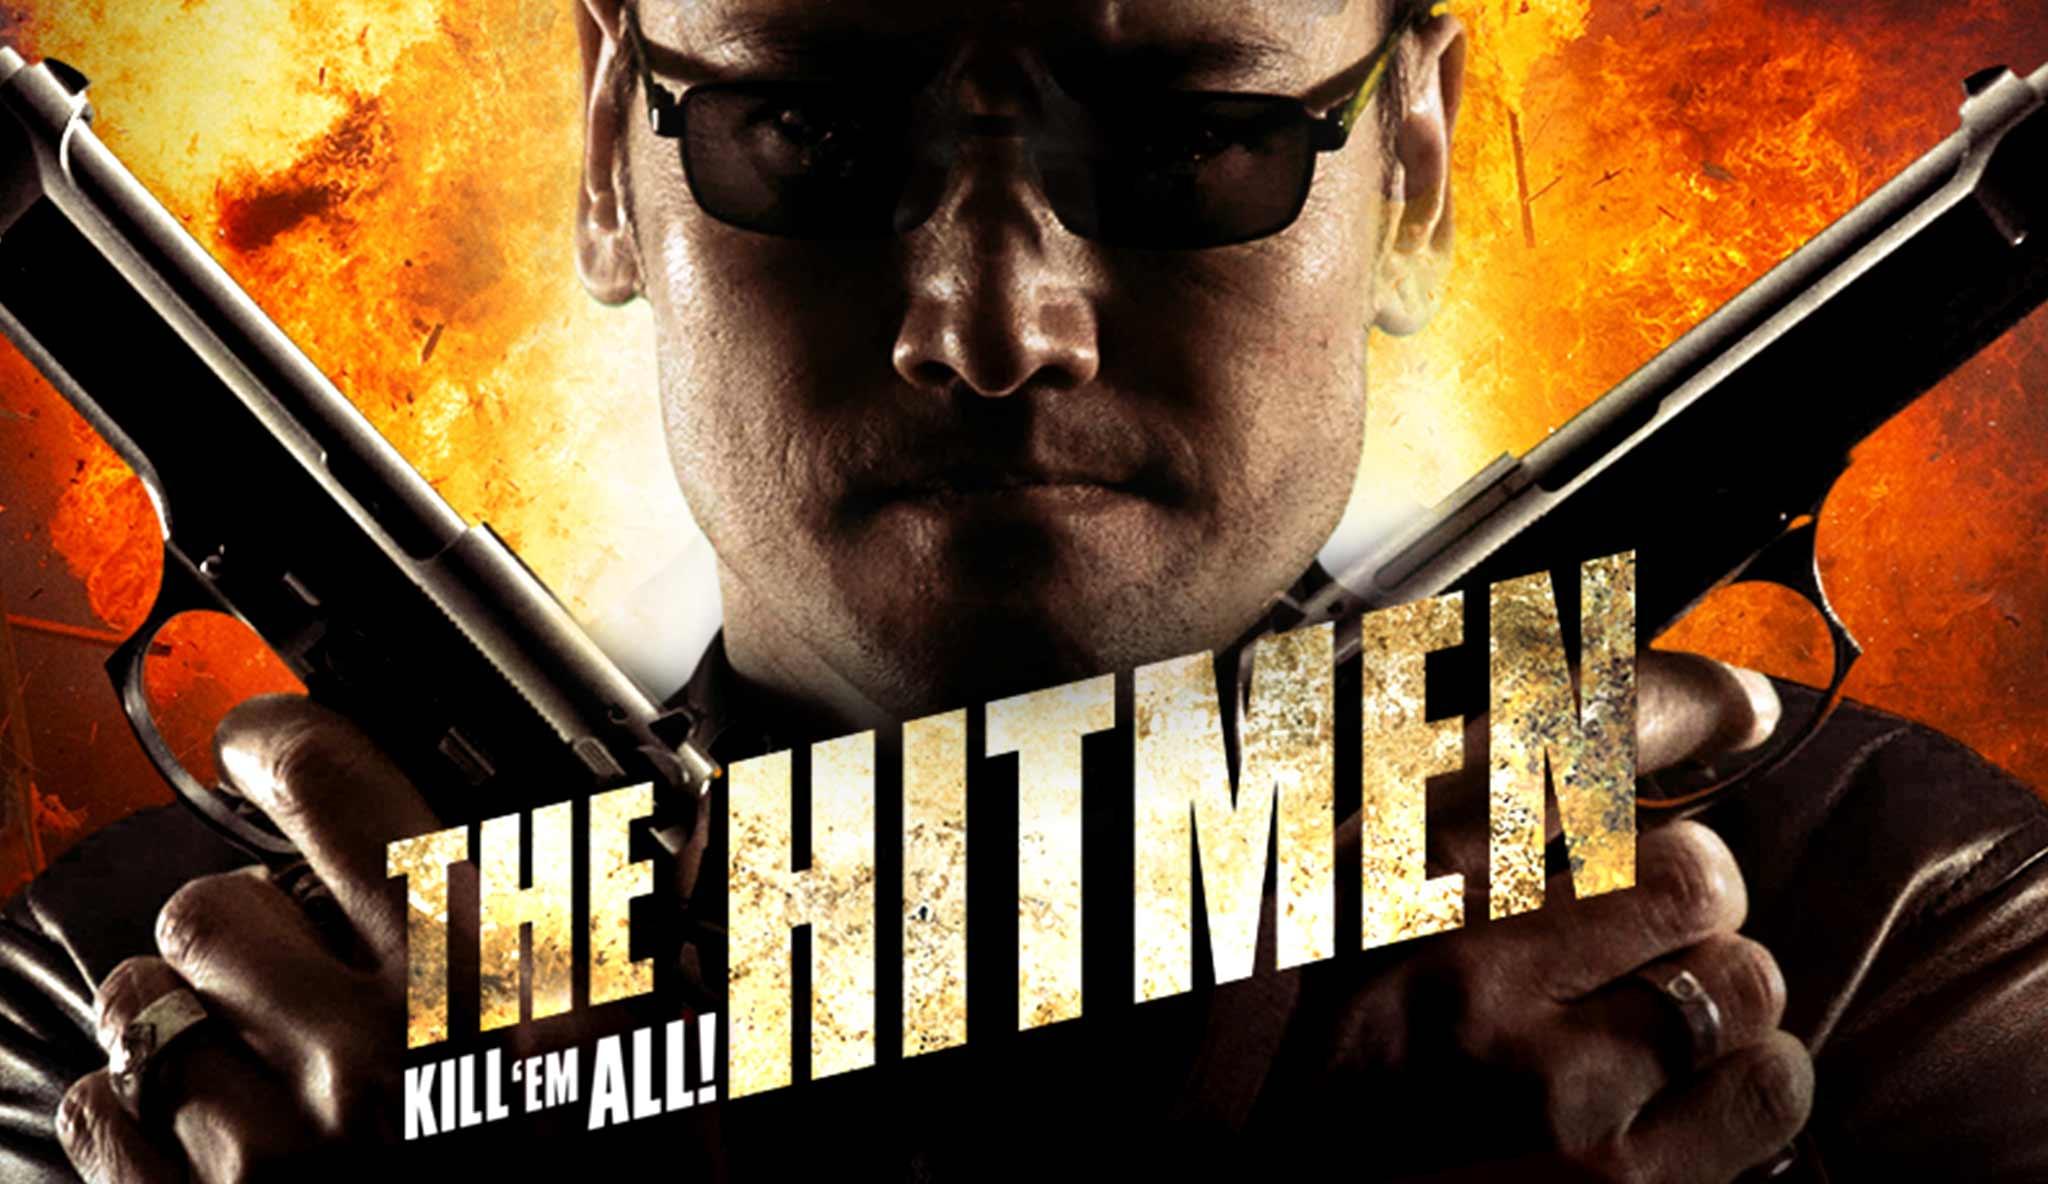 the-hitmen-kill-em-all\header.jpg